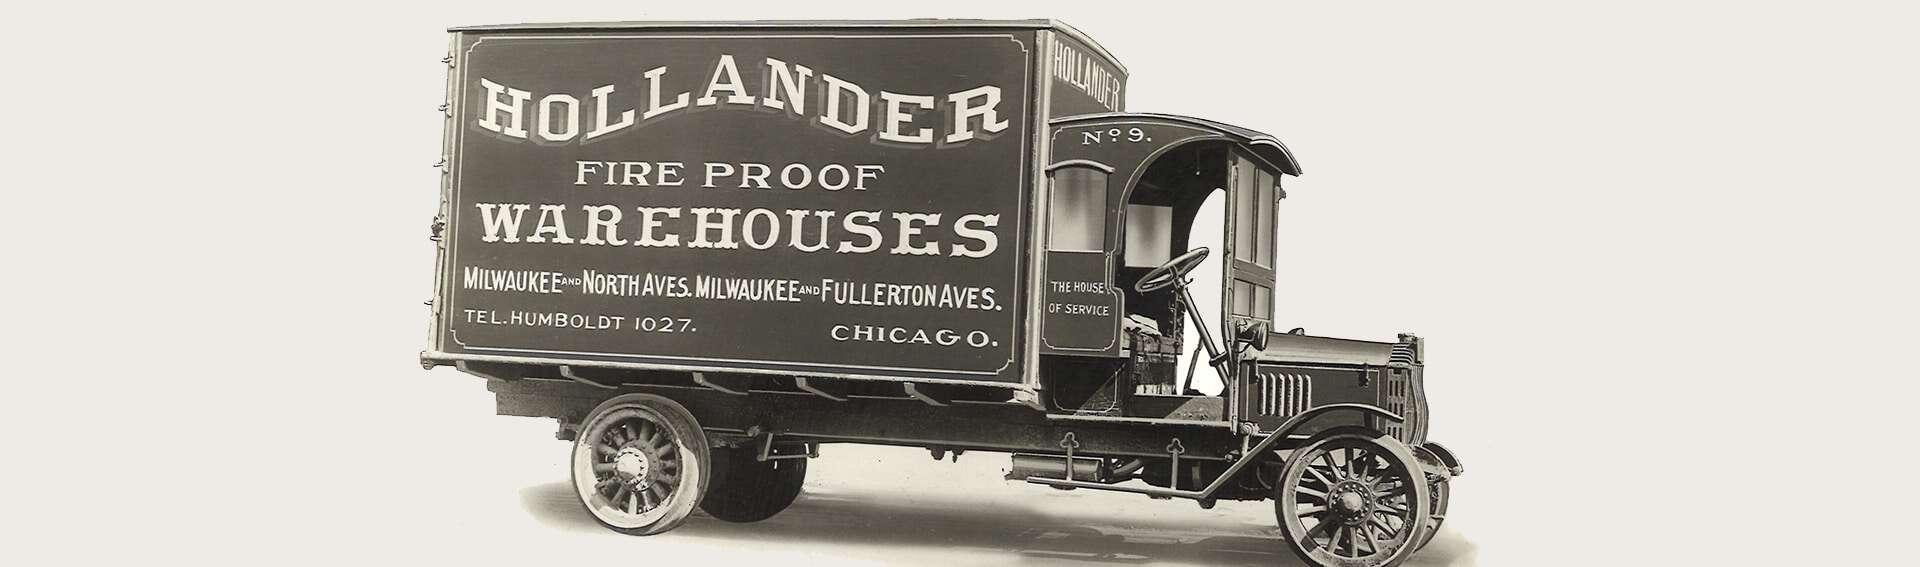 chicago-hollander-banner